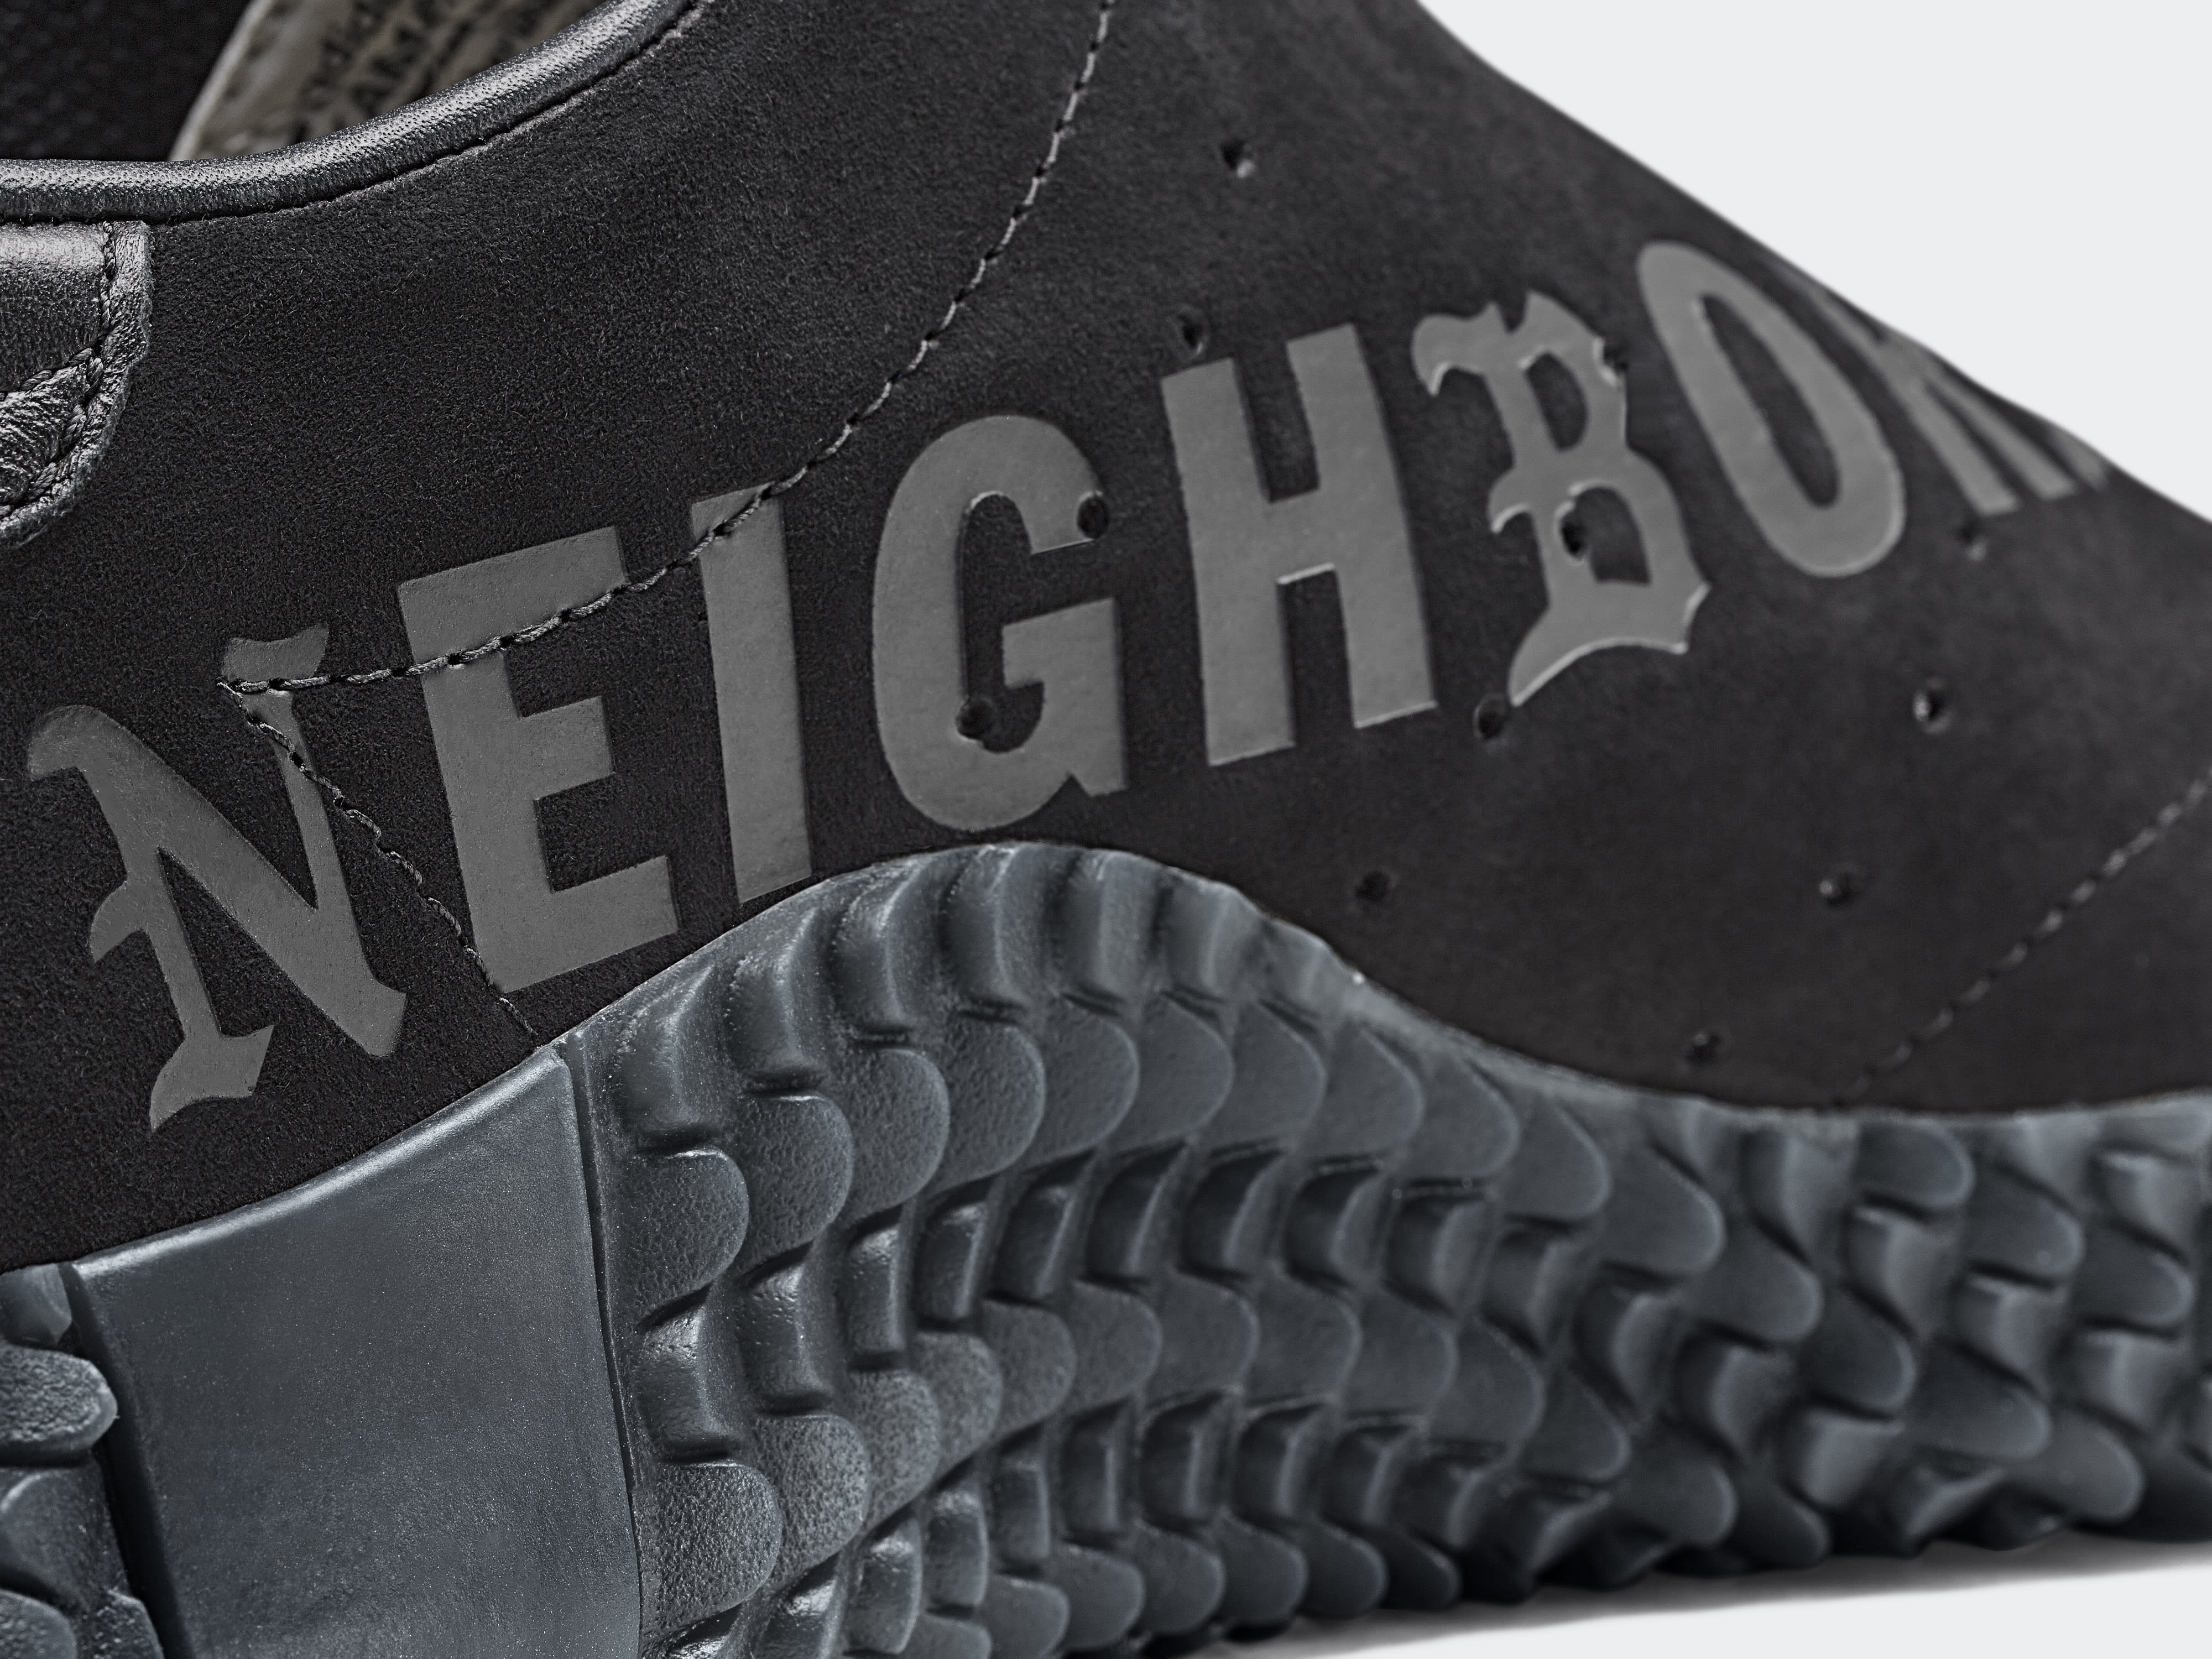 Neighborhood x Adidas Kamanda B37341 (Detail)